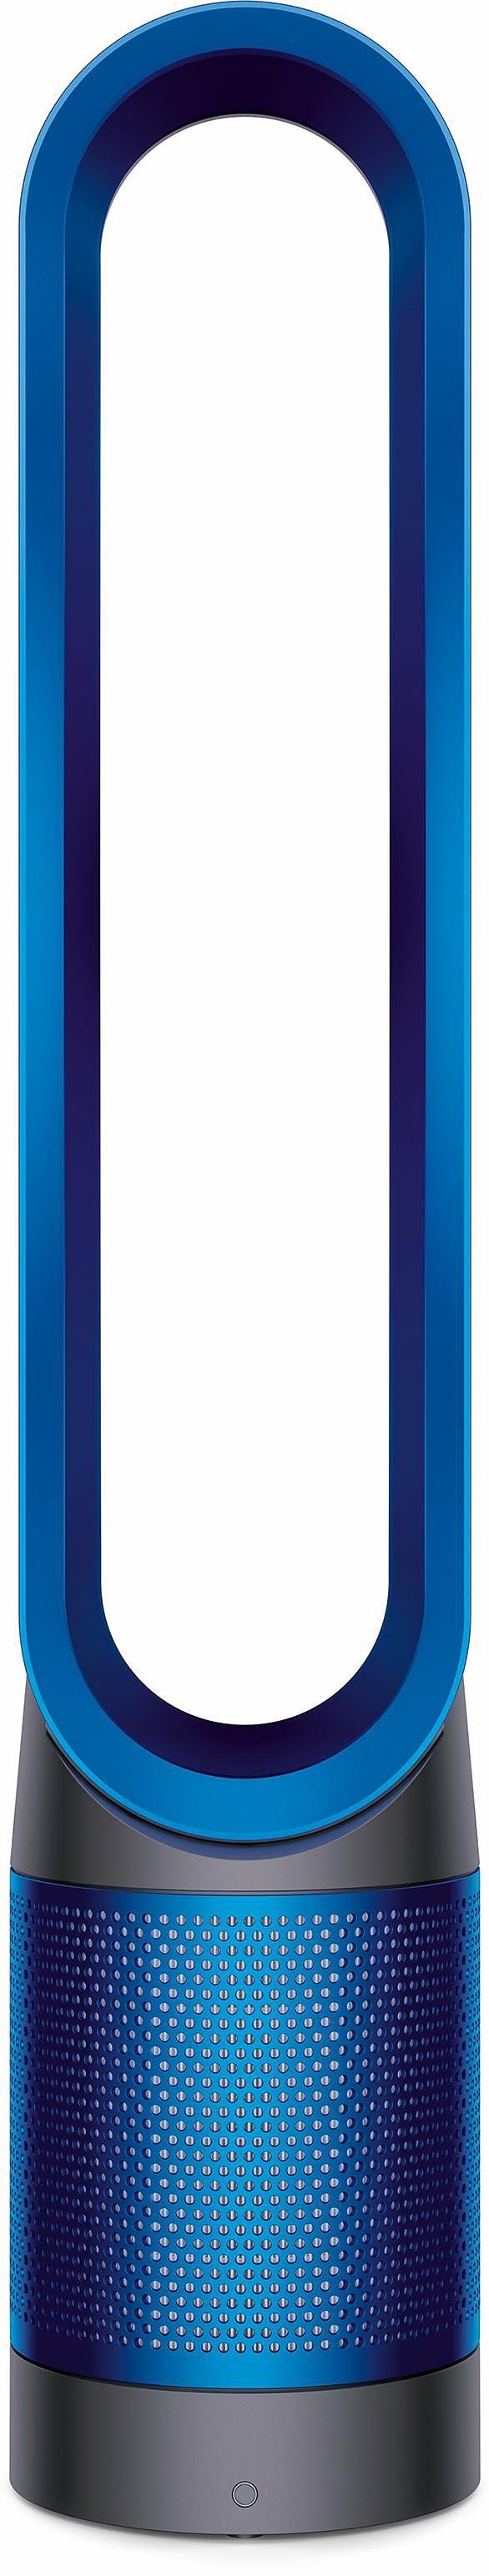 DYSON Luftreiniger Pure Cool Link, Turm-Gerät